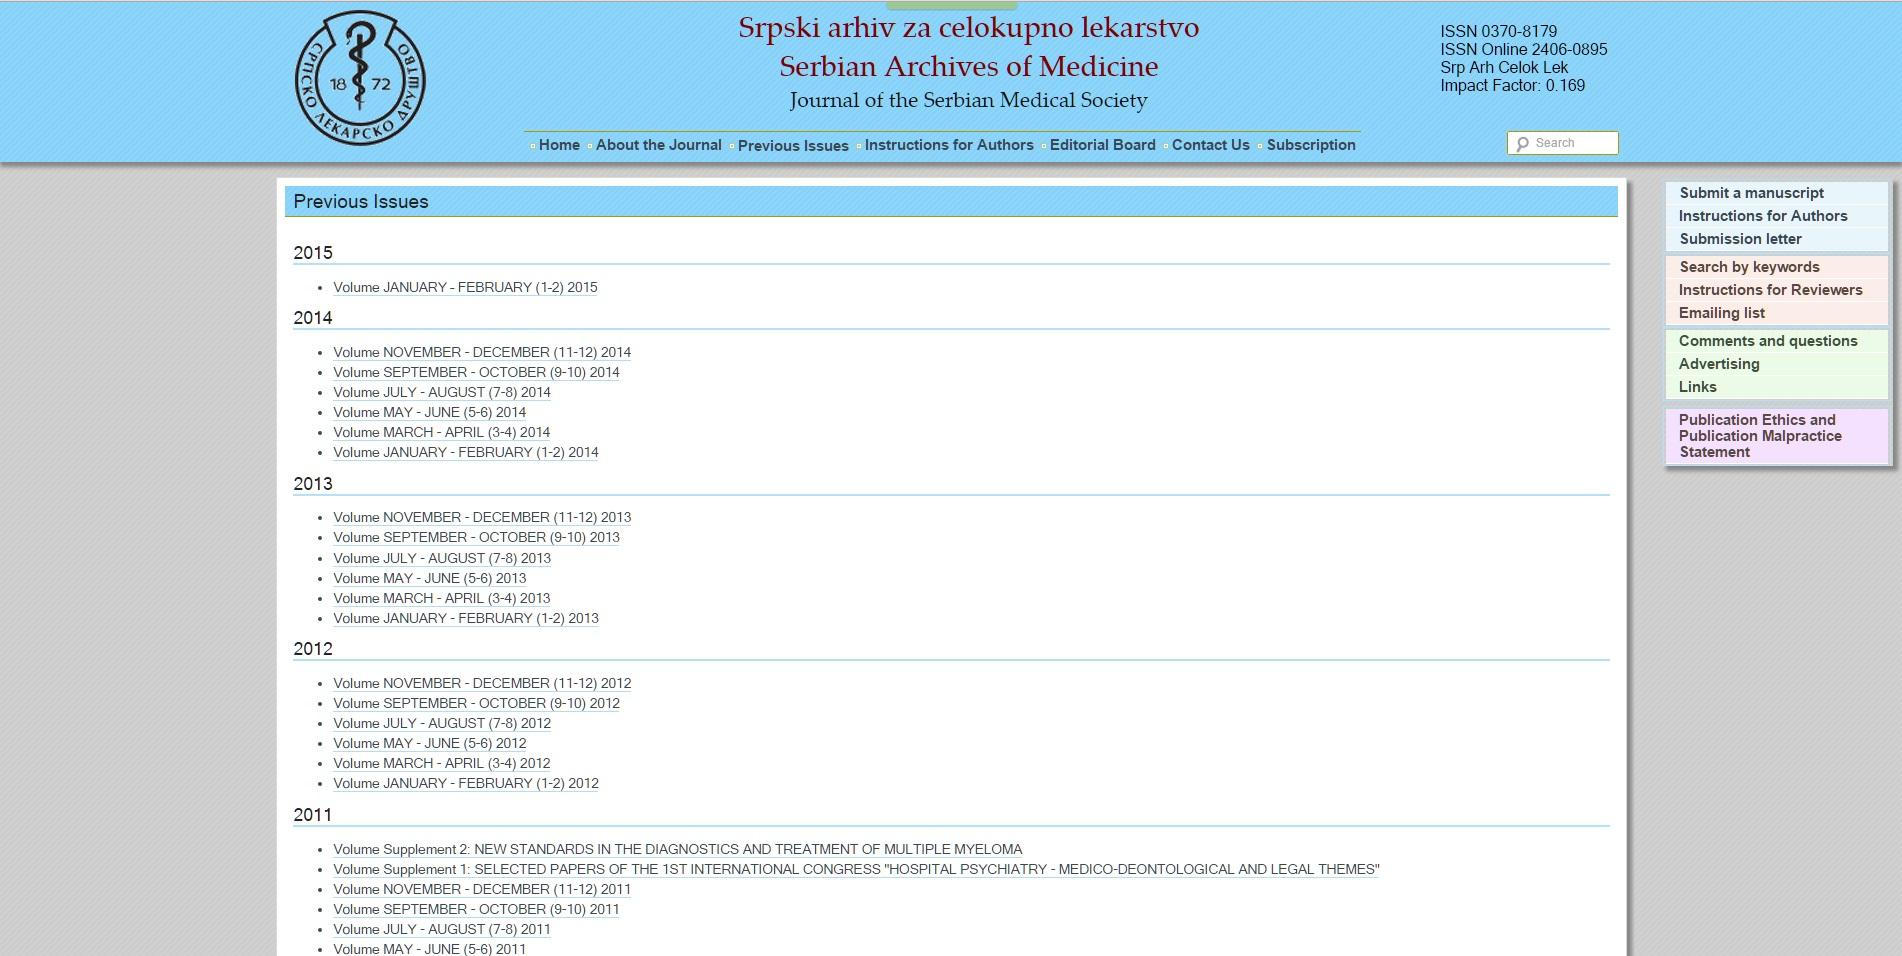 srparh_31